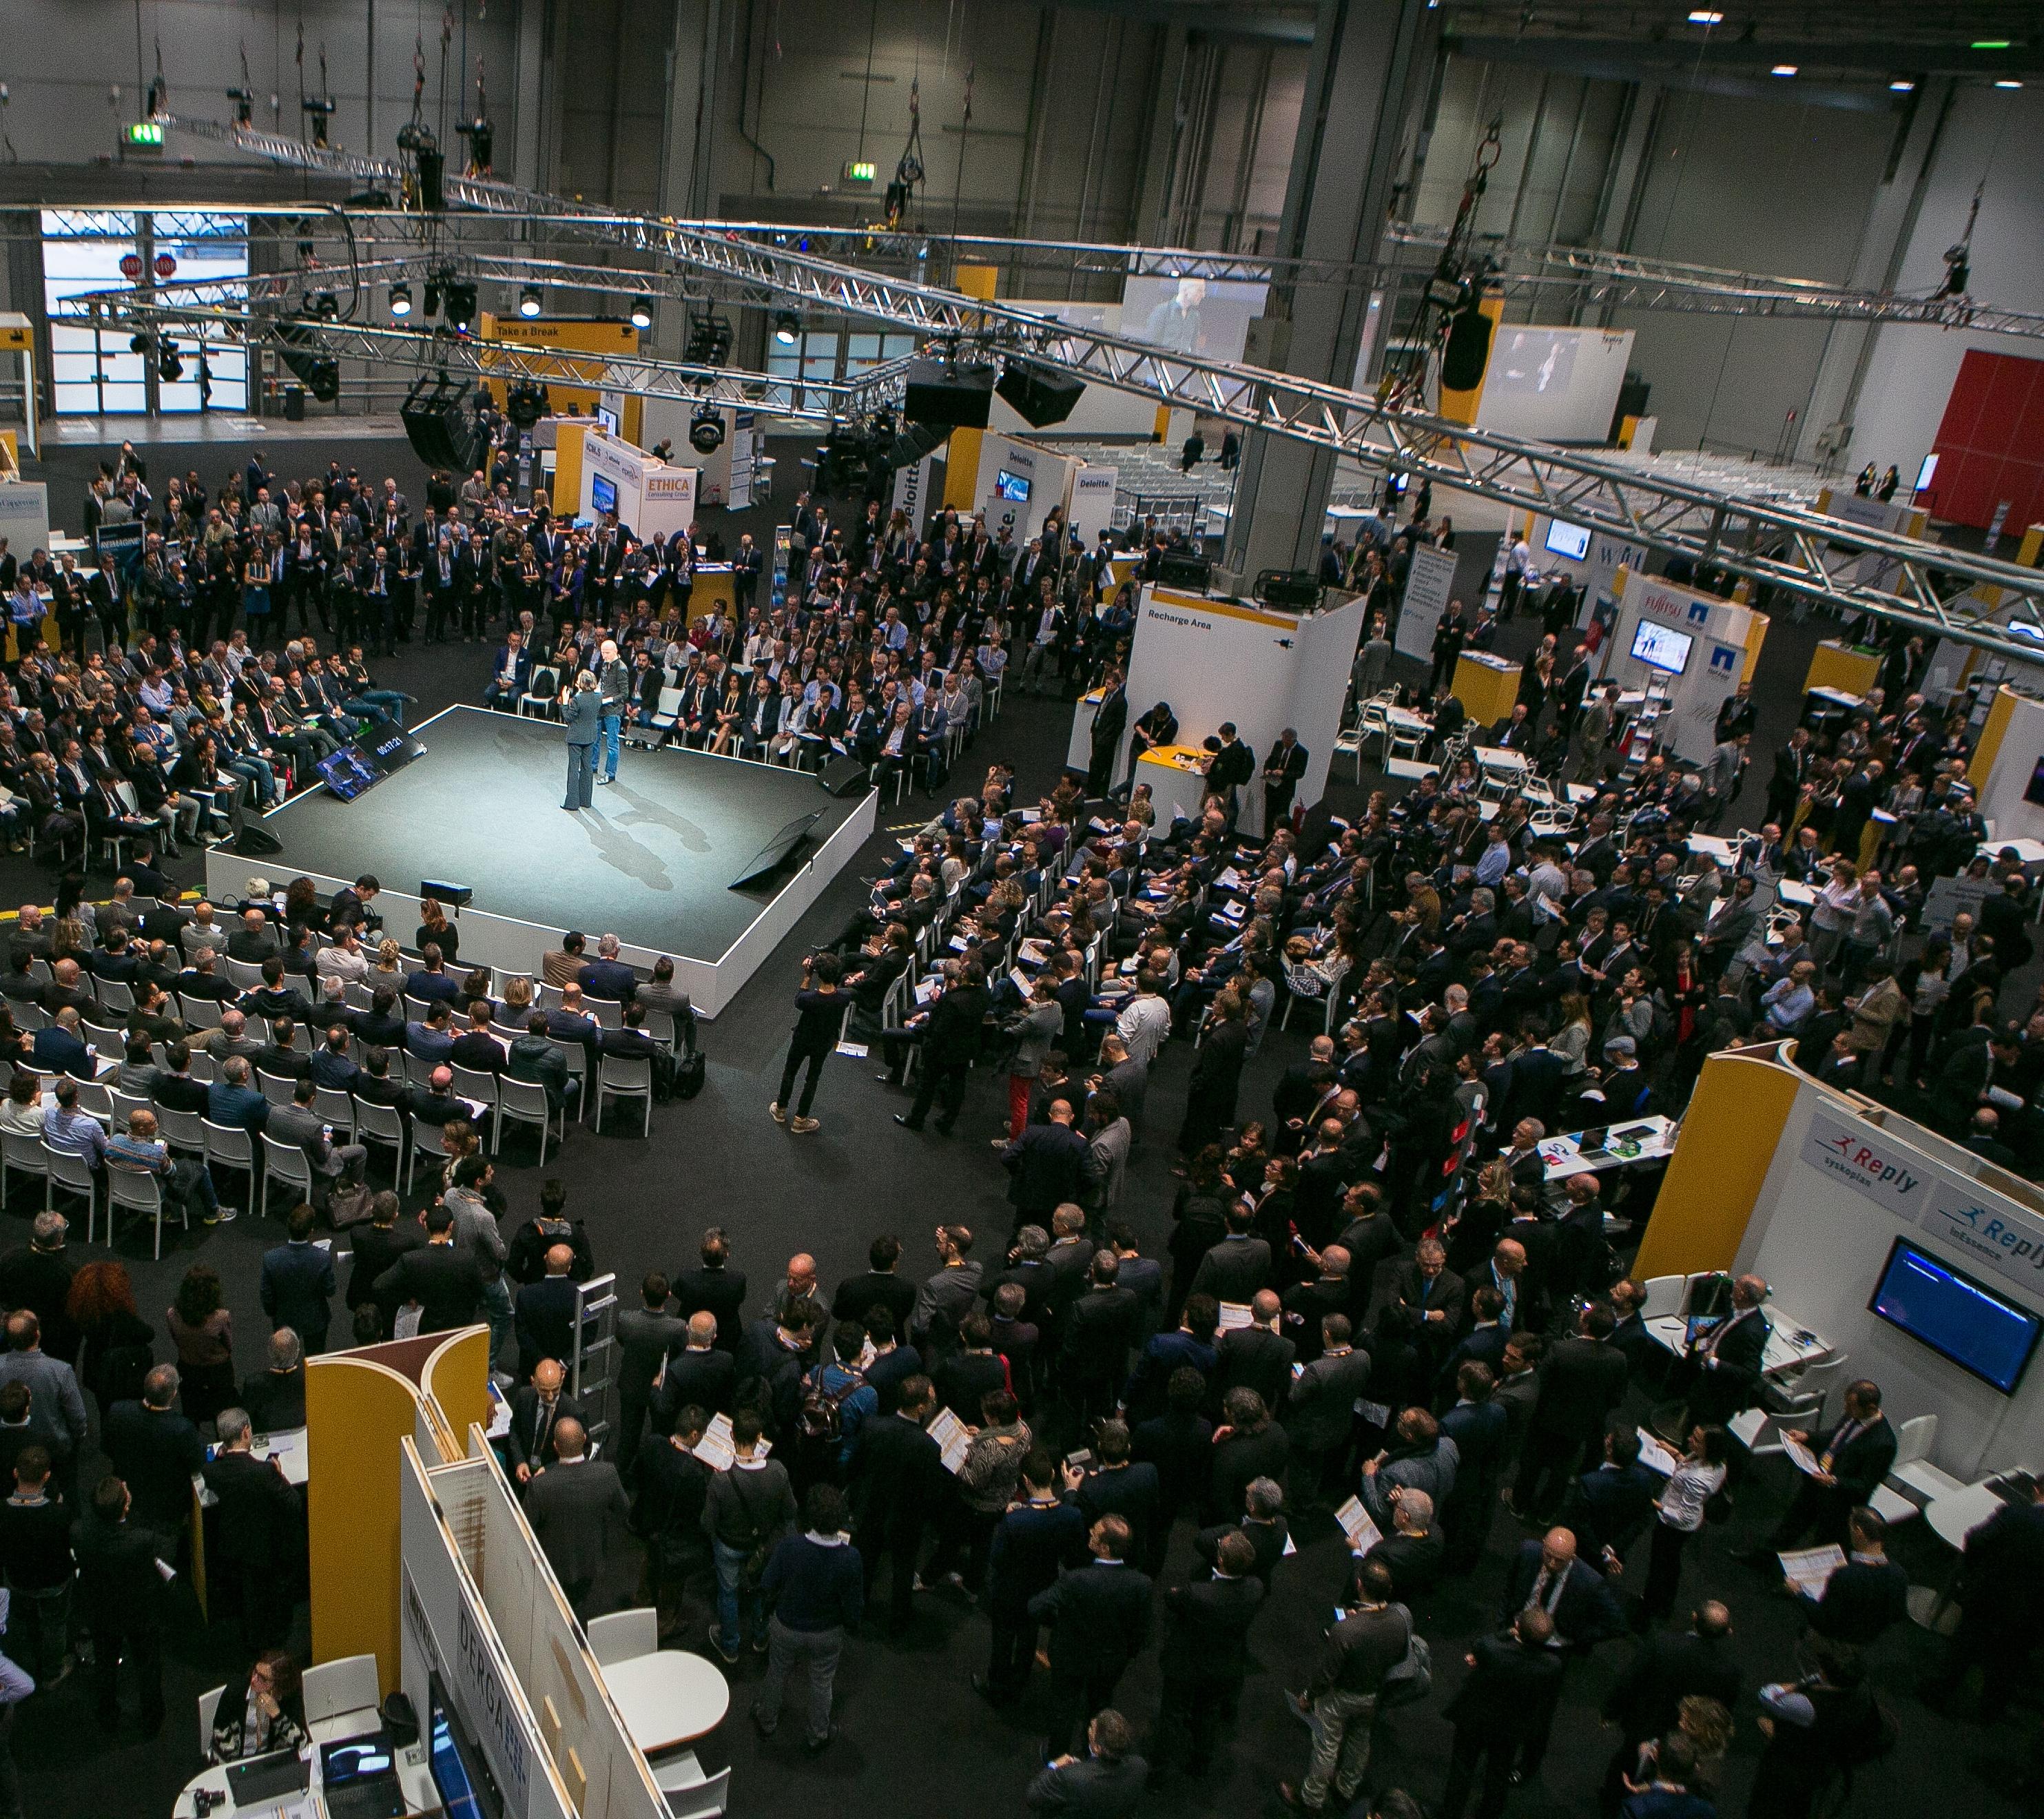 Un momento del SAP Forum 2016 a Milano